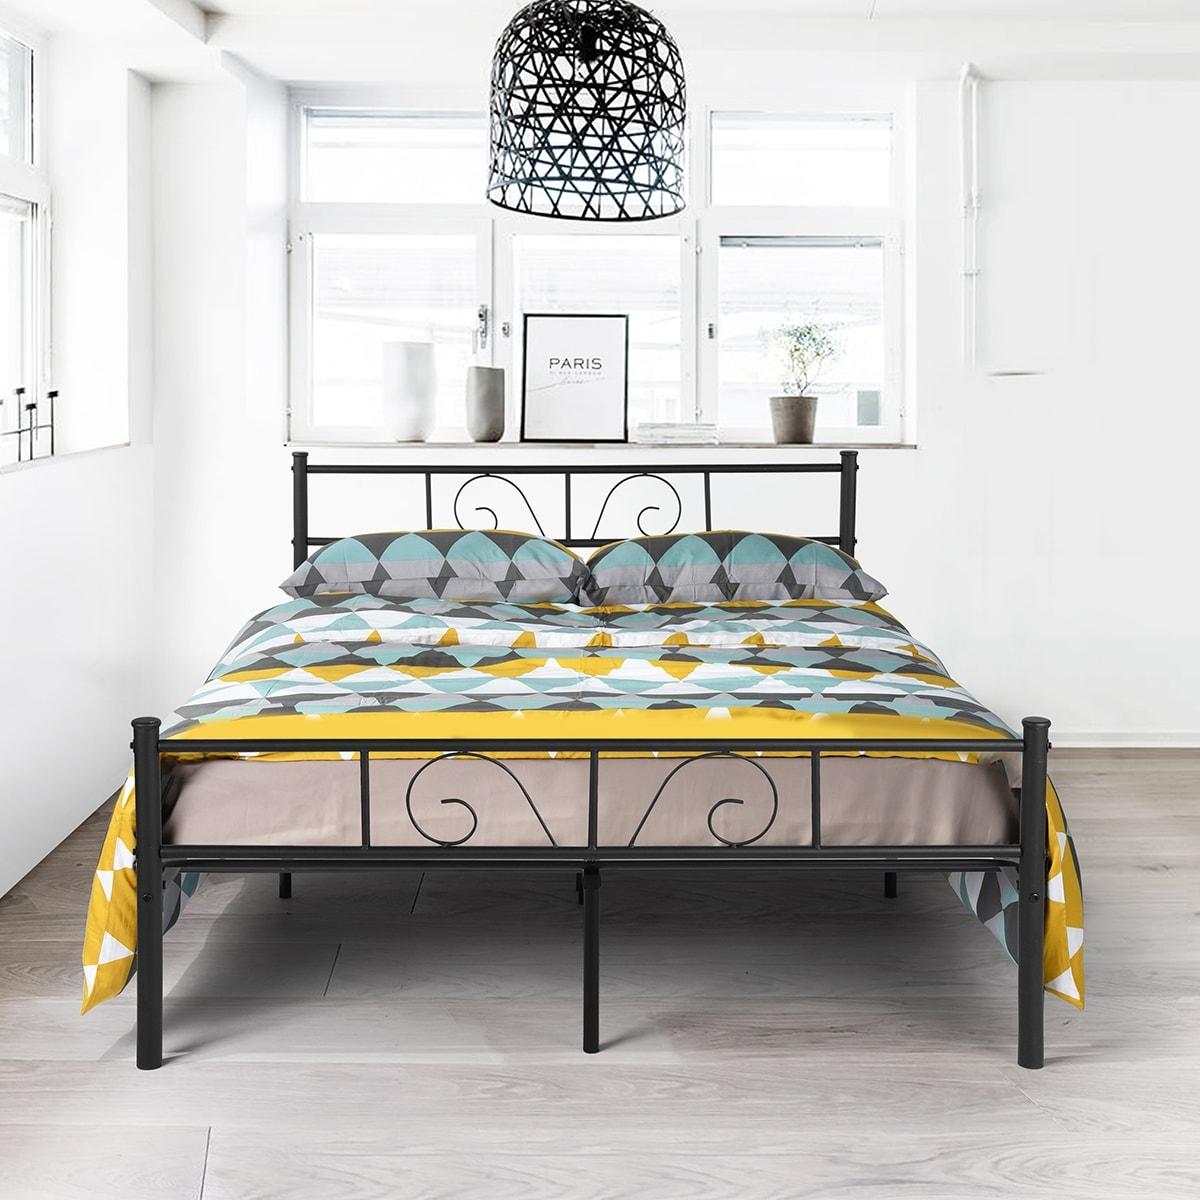 Twin/Full Size Metal Bed Frame Platform Bedroom Furniture with  headboard-white/black